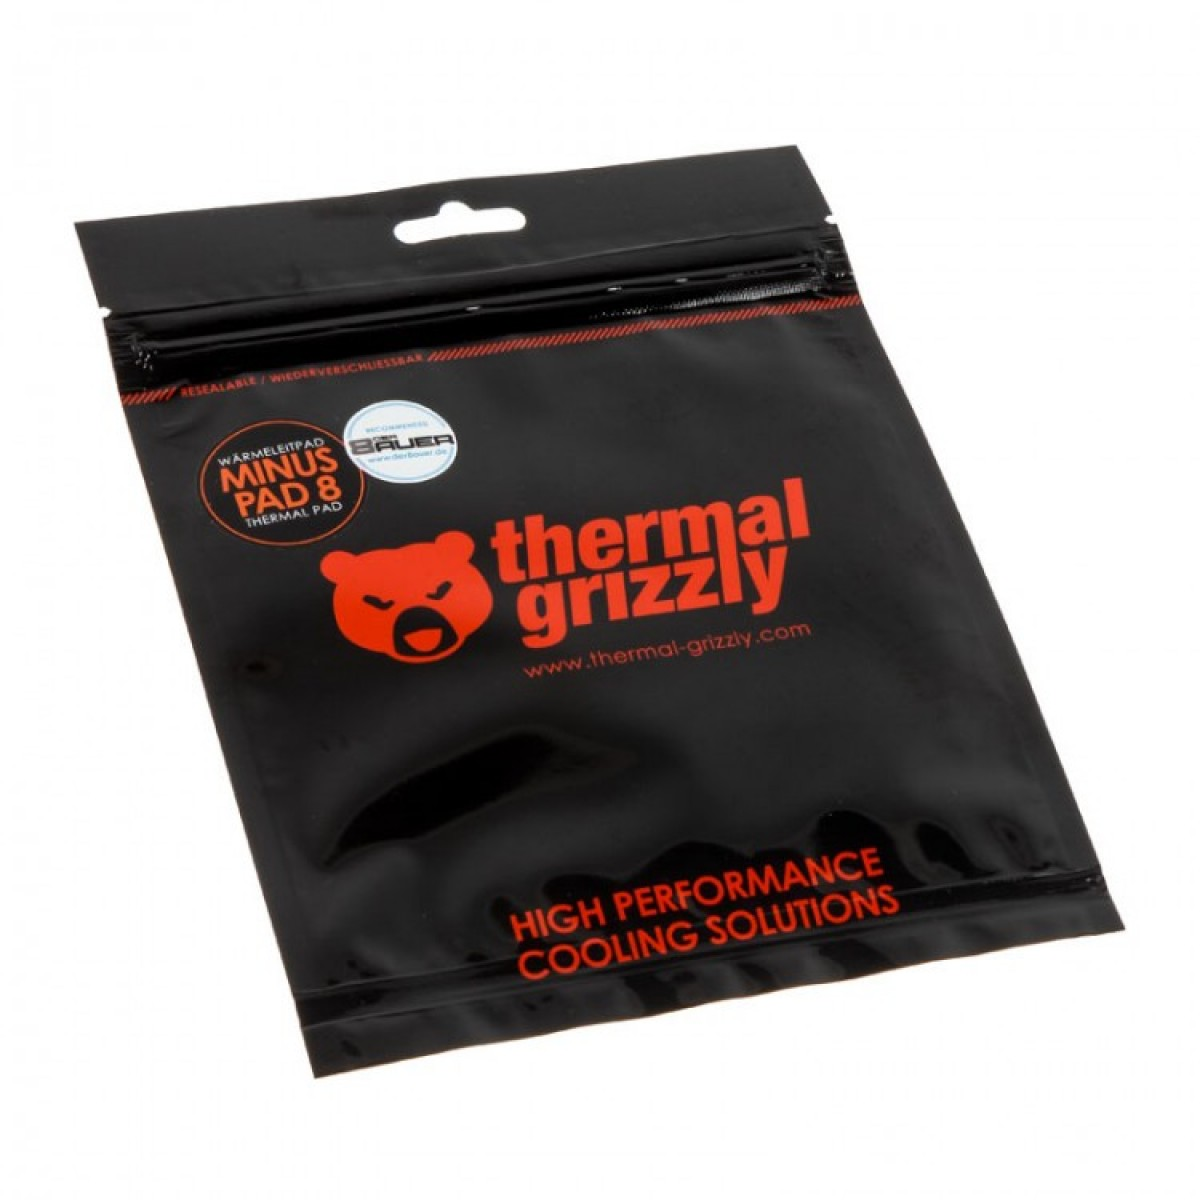 Pad Térmico Thermal Grizzly Minus Pad 8, 120 x 20 x 0,5 mm, TG-MP8-120-20-05-2R